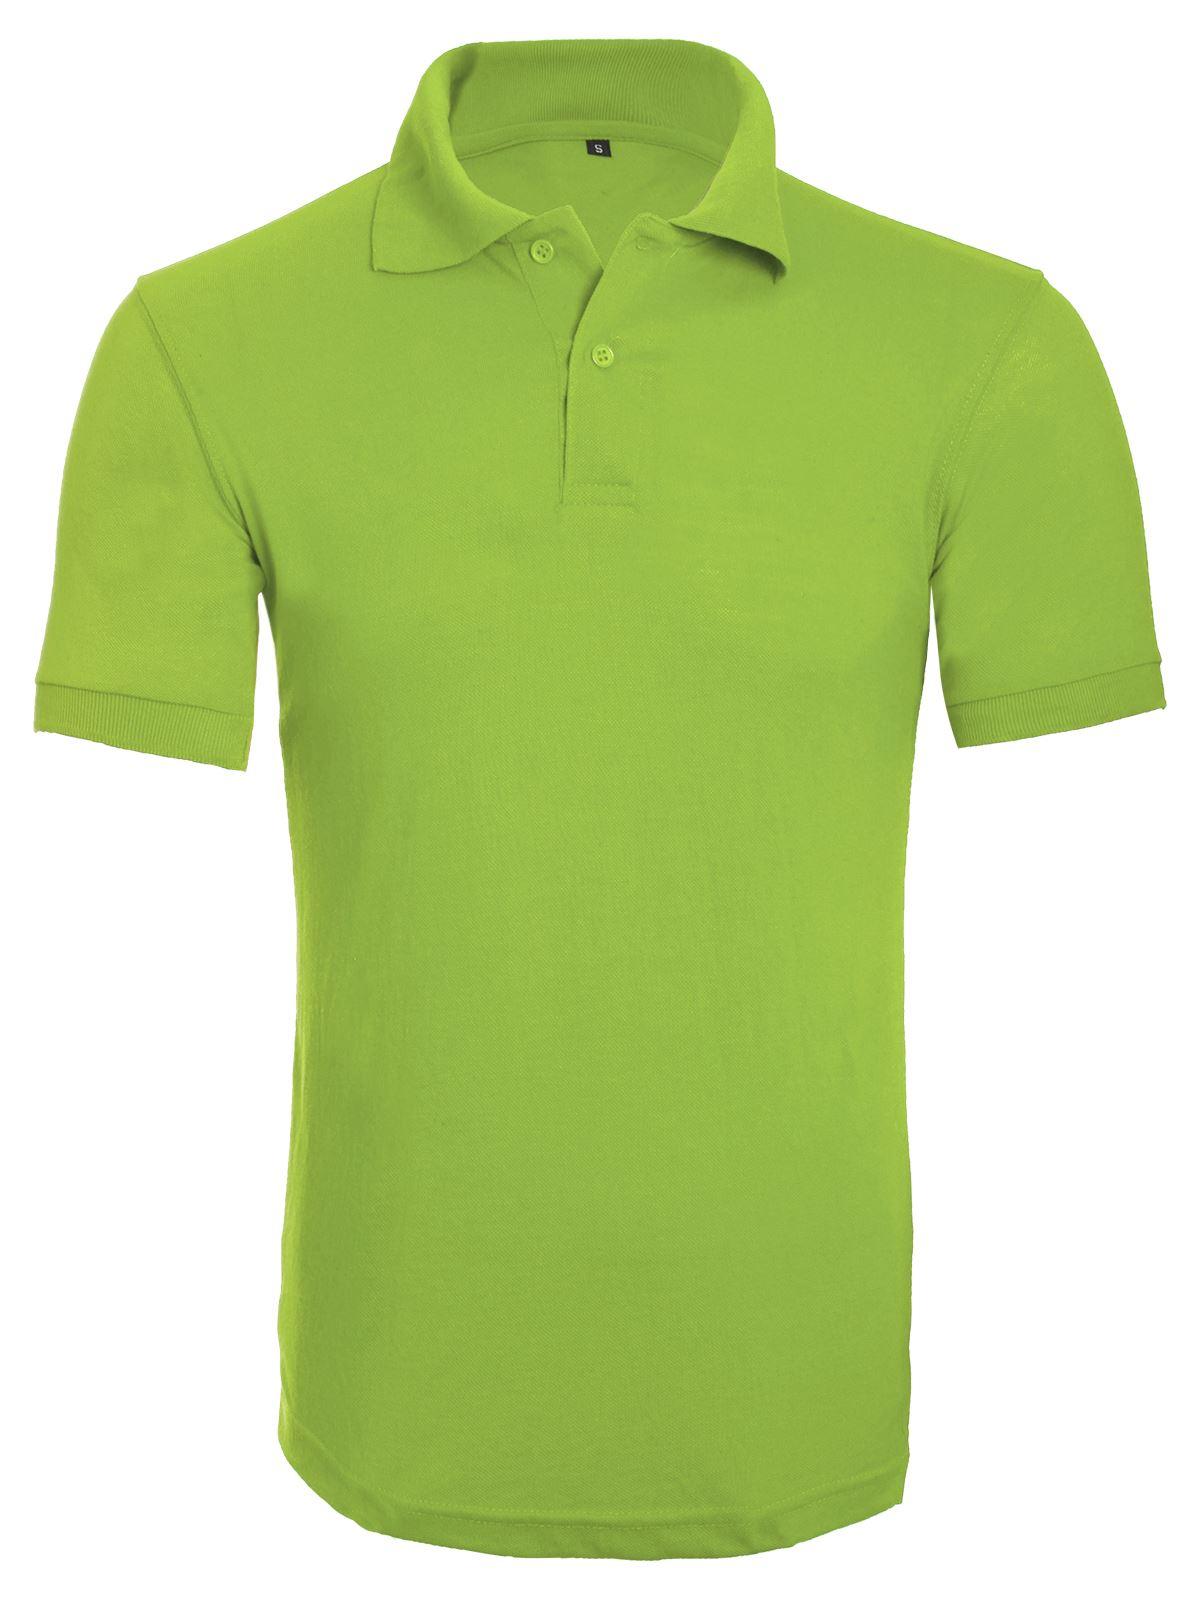 Womens mens unisex plain polo casual short sleeve shirt for Mens work polo shirts